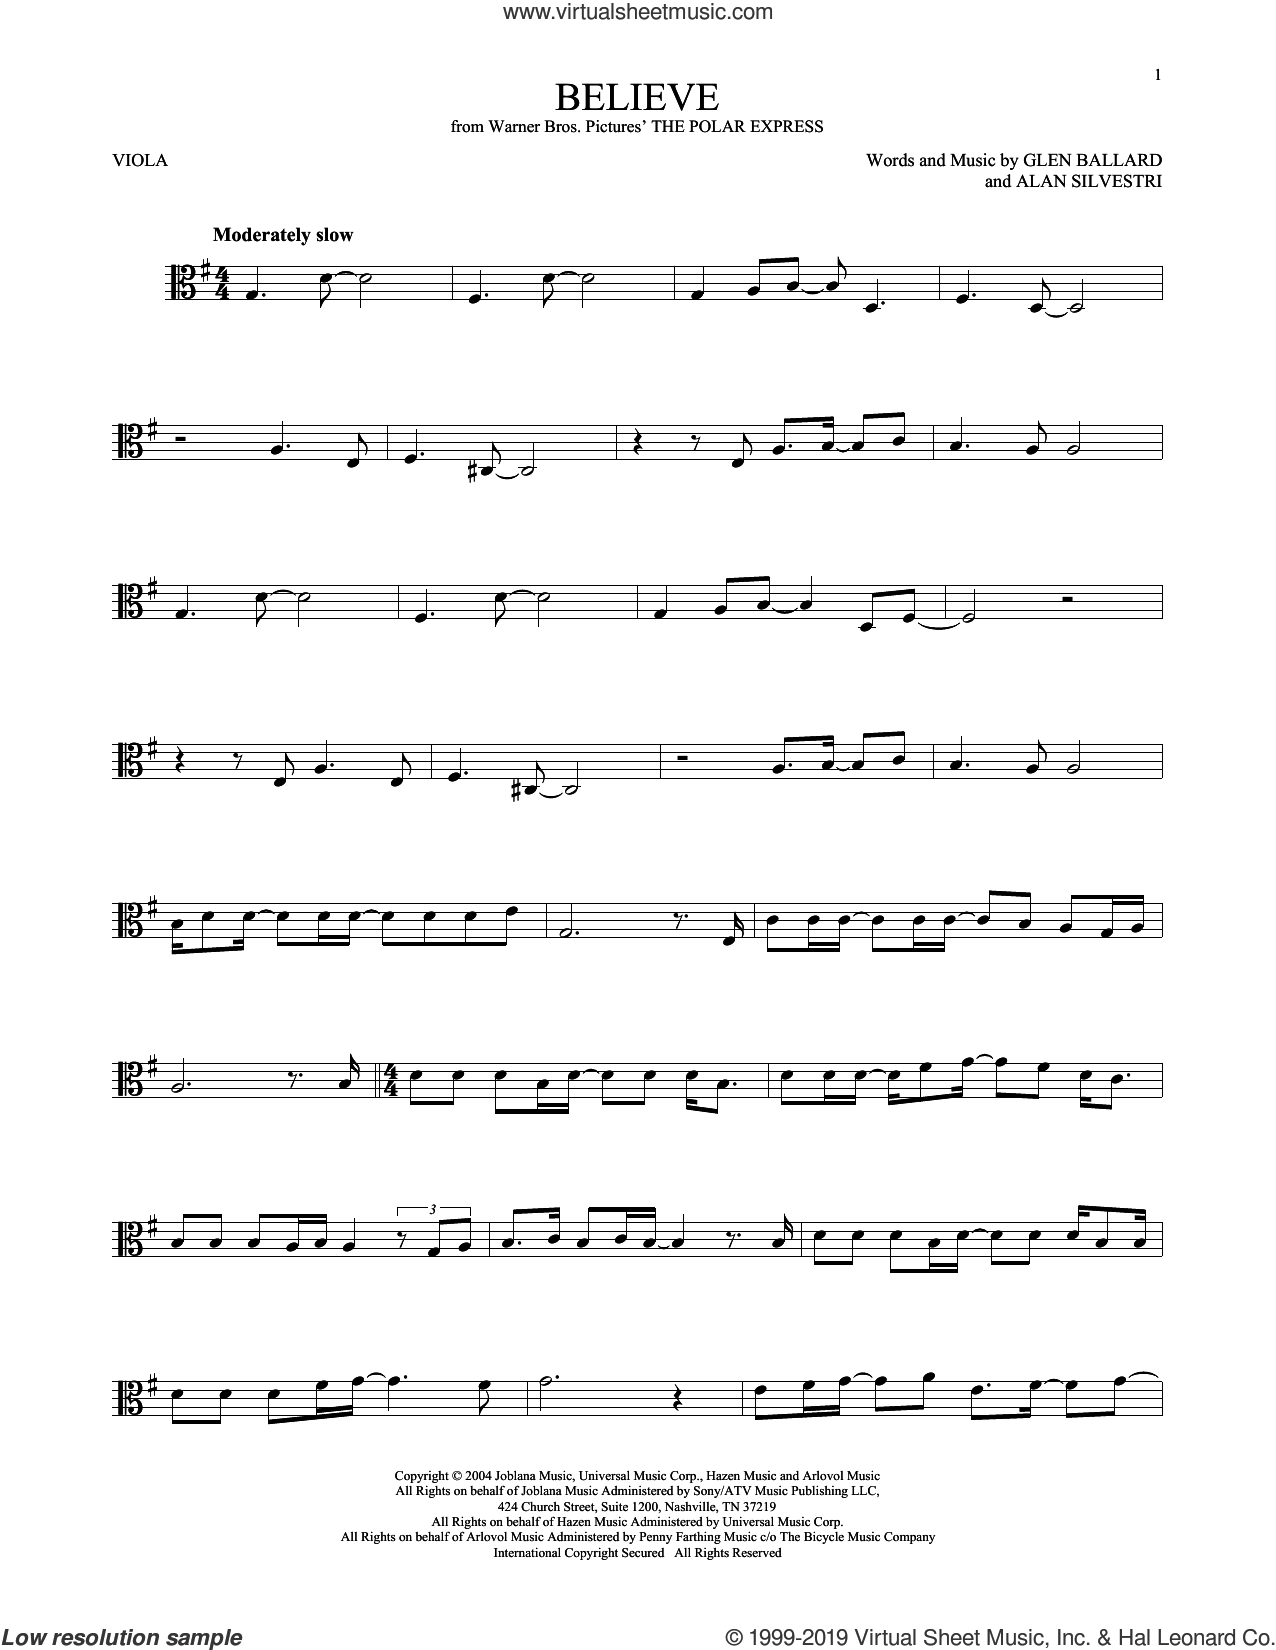 Believe (from The Polar Express) sheet music for viola solo by Josh Groban, Alan Silvestri and Glen Ballard, intermediate skill level